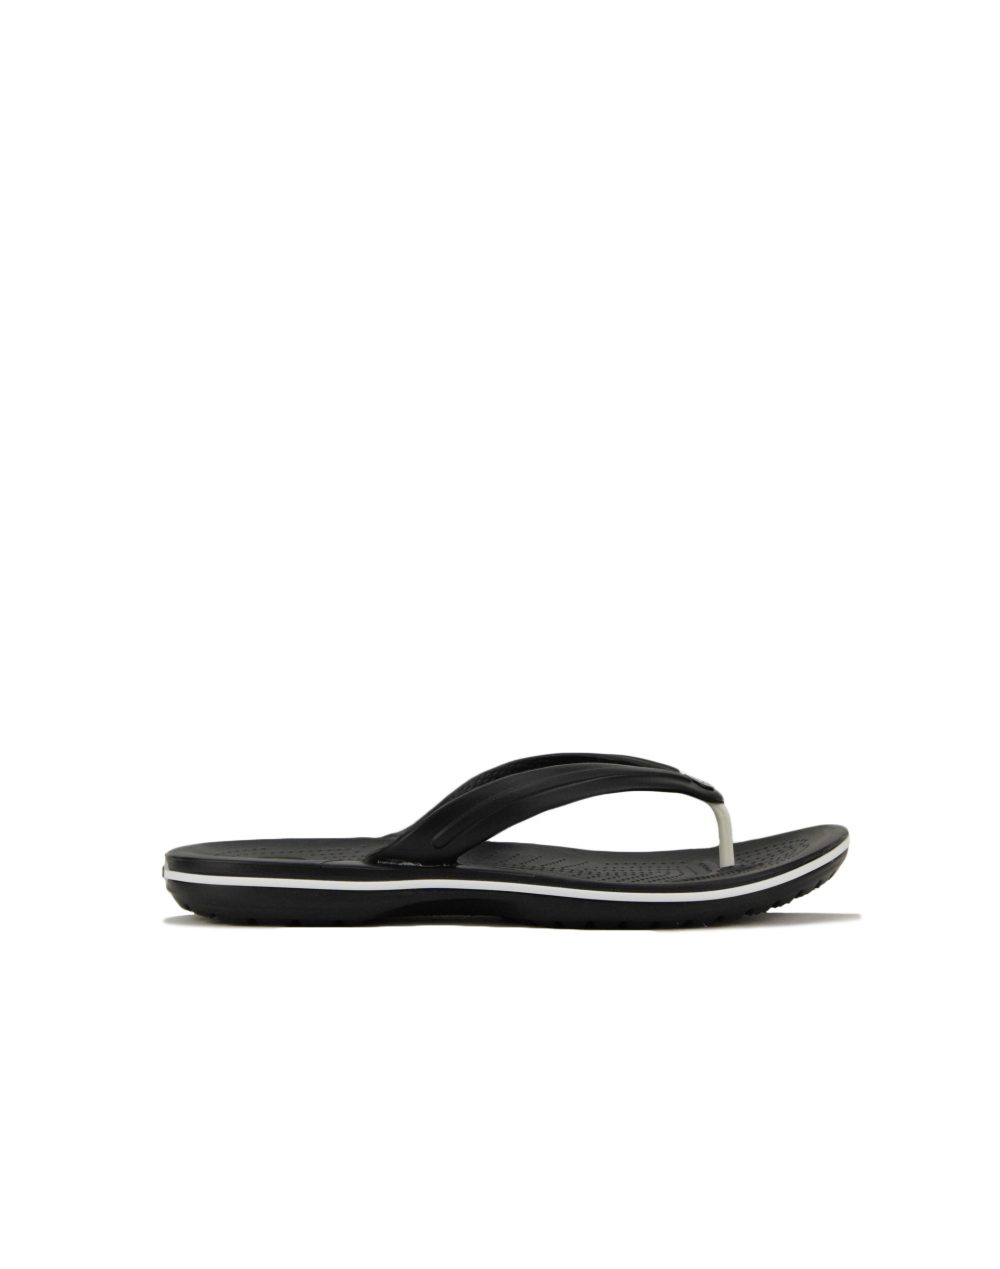 Crocs Crocband Flip (11033-001) Black